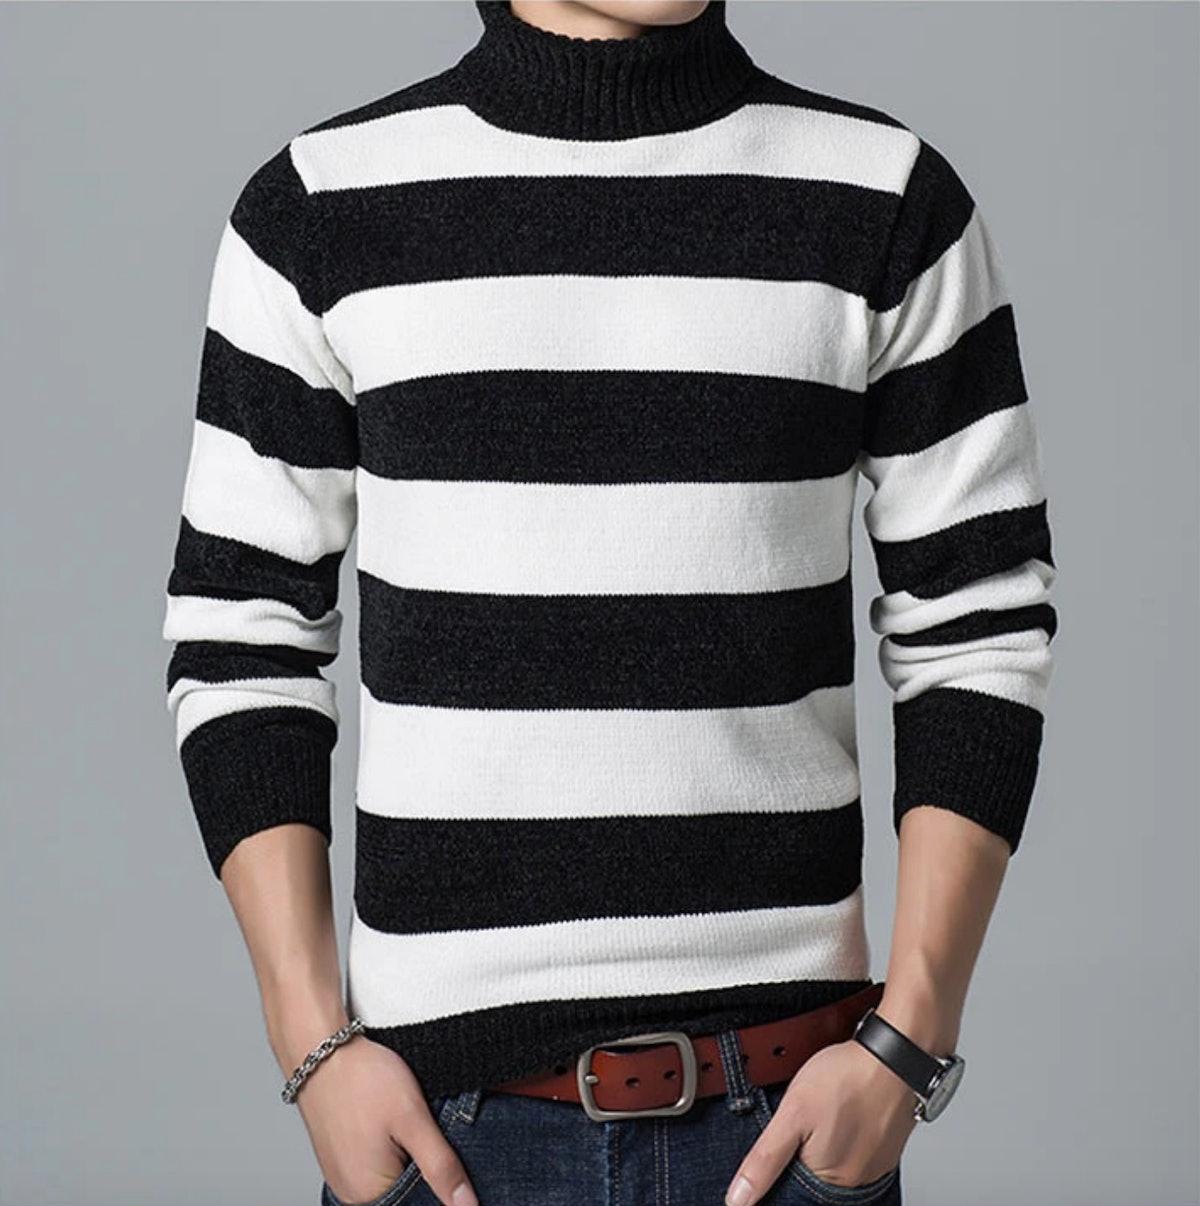 David Rose from 'Schitt's Creek' loves striped sweaters.